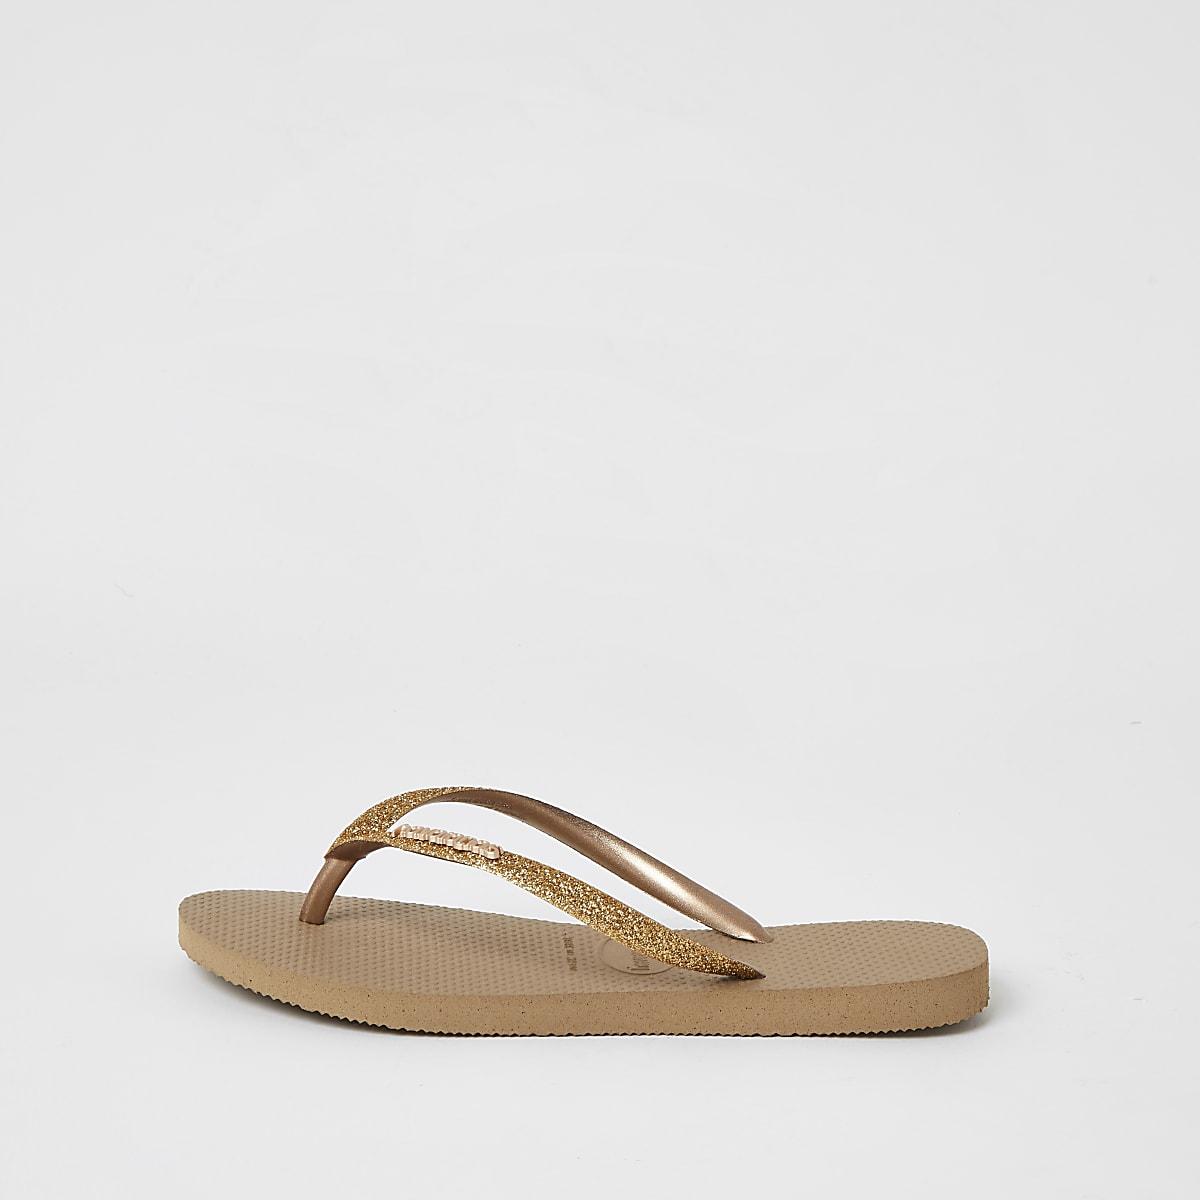 Havianas gold glitter slim flip flops